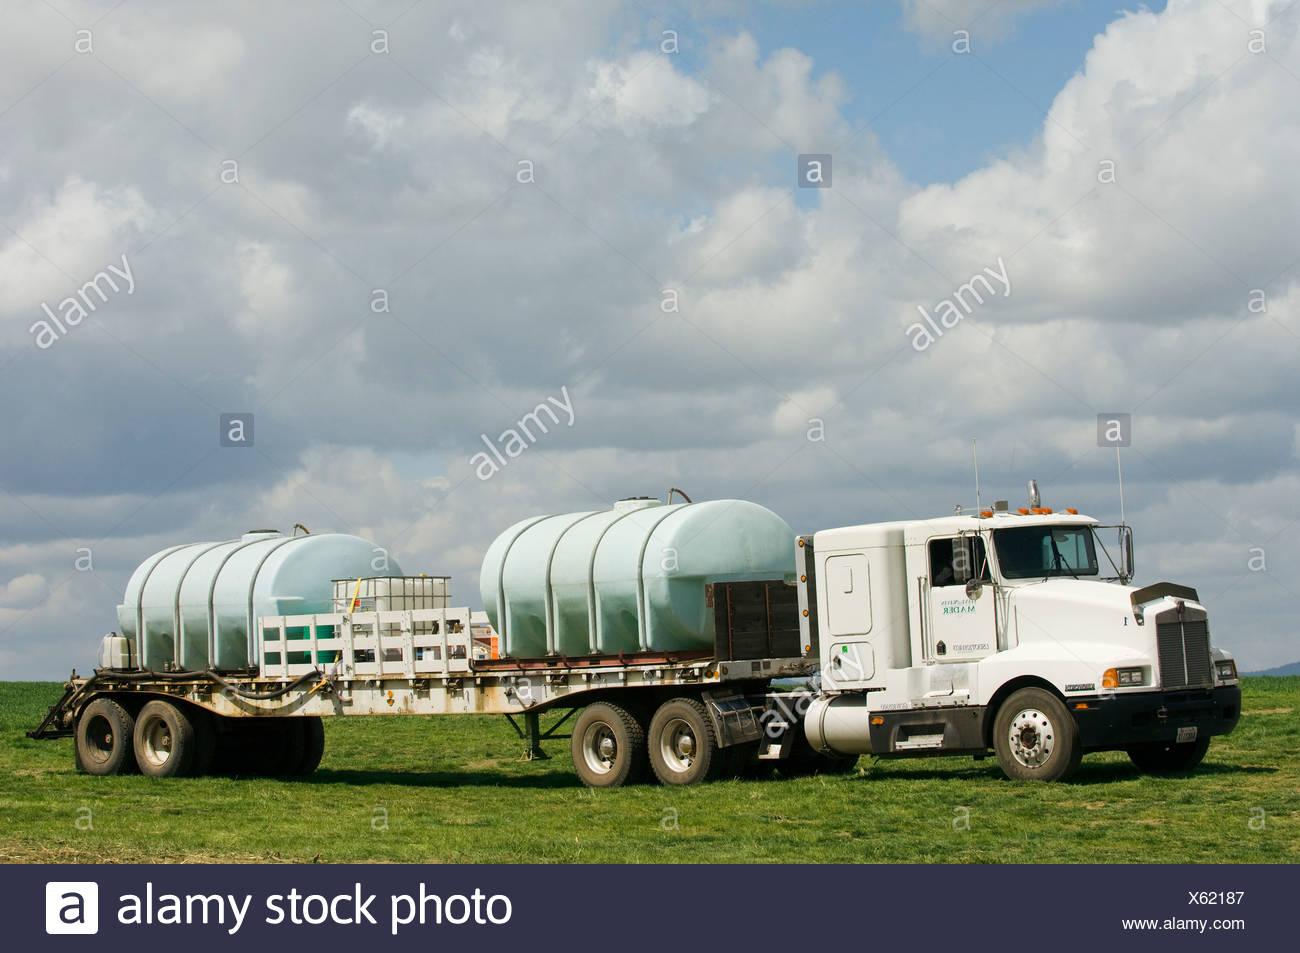 wheat truck stockfotos wheat truck bilder alamy. Black Bedroom Furniture Sets. Home Design Ideas